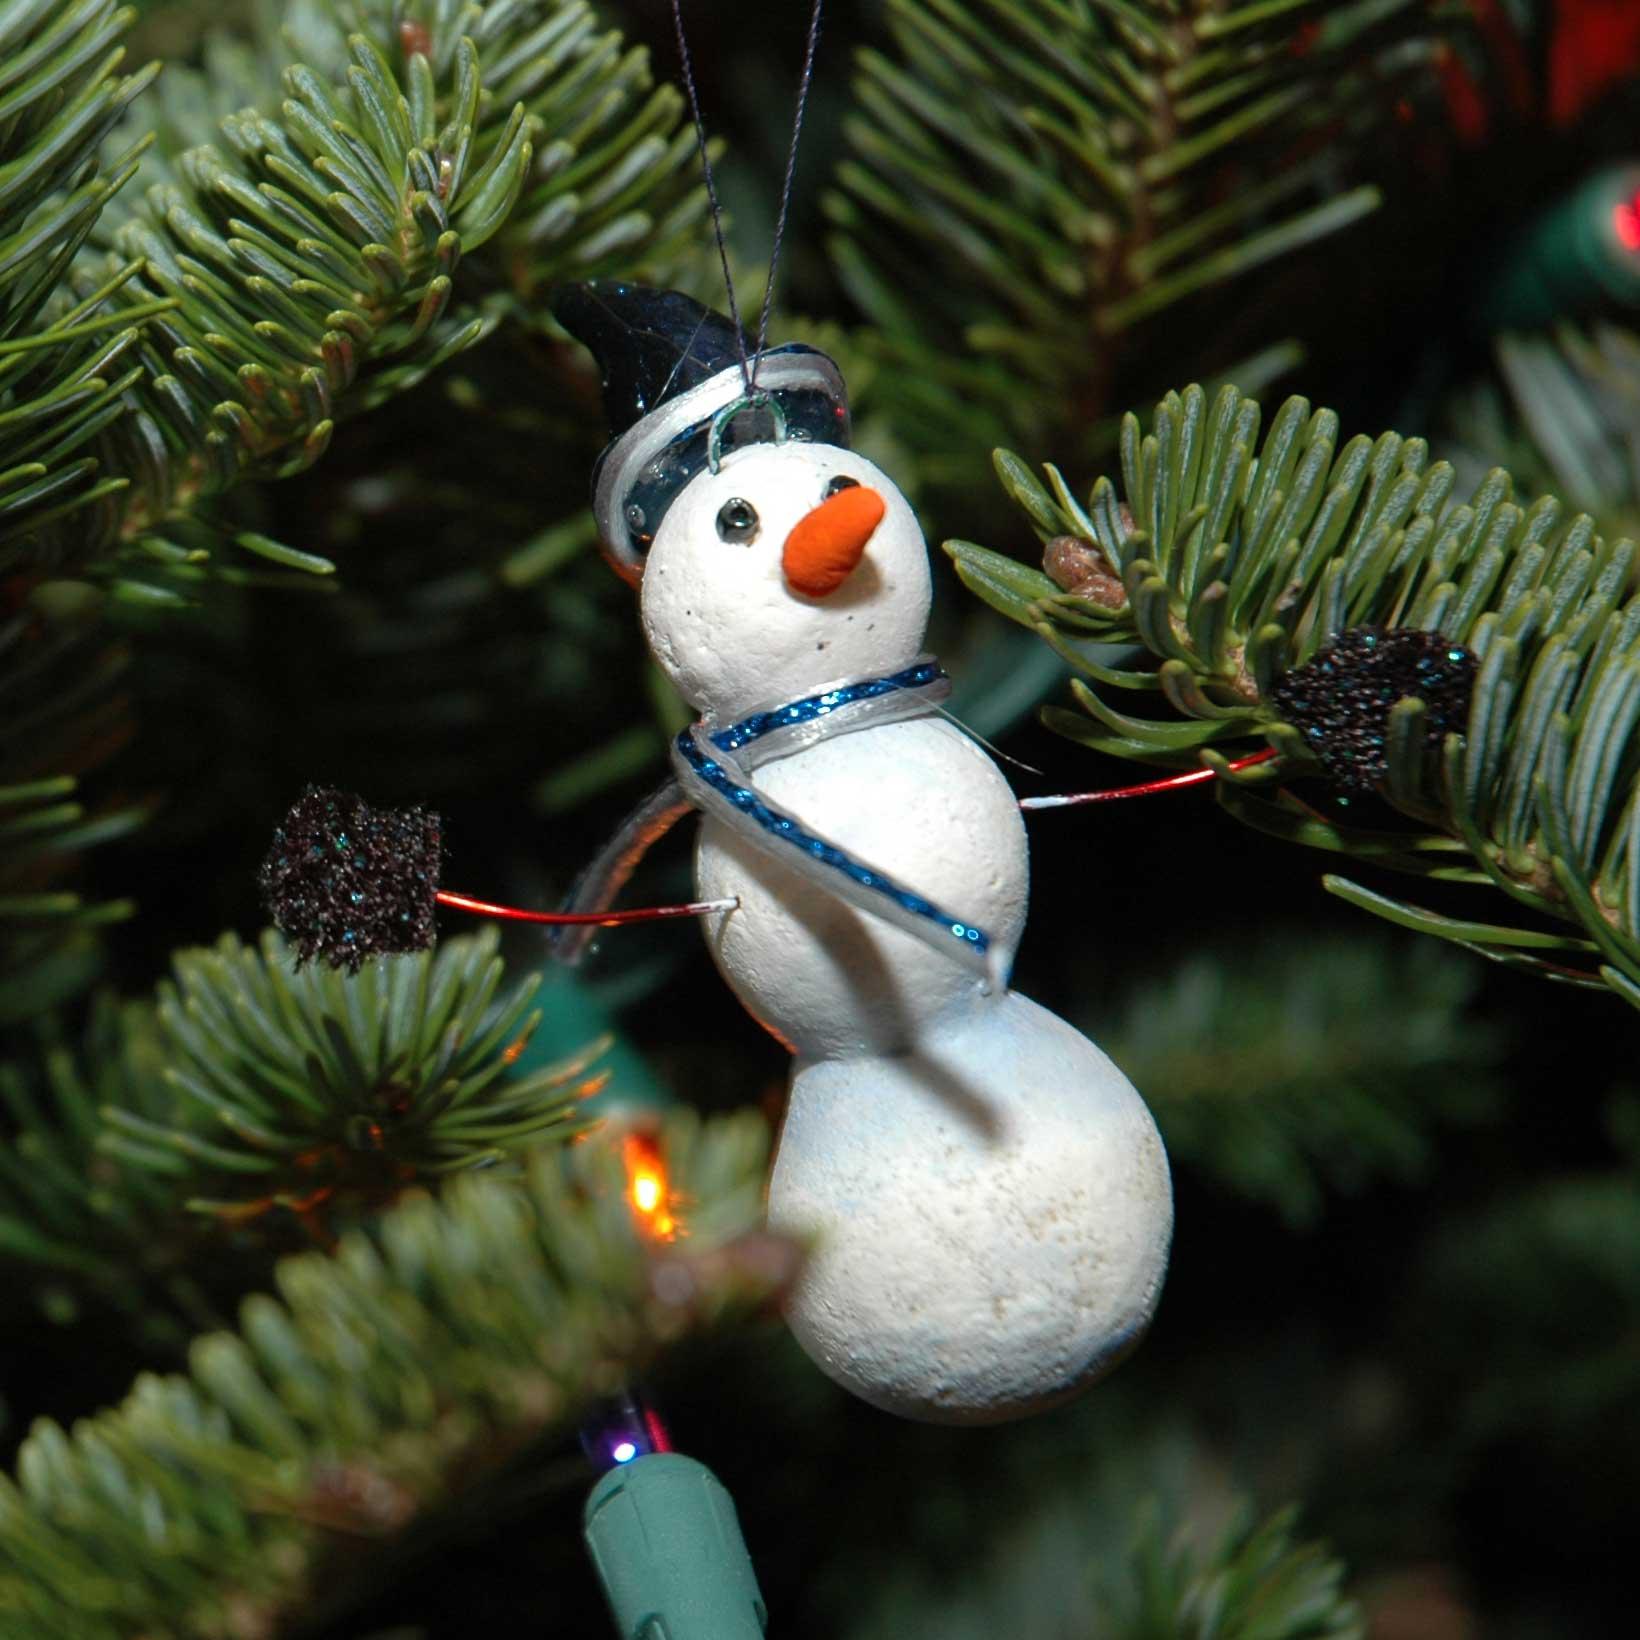 Snowman I made.